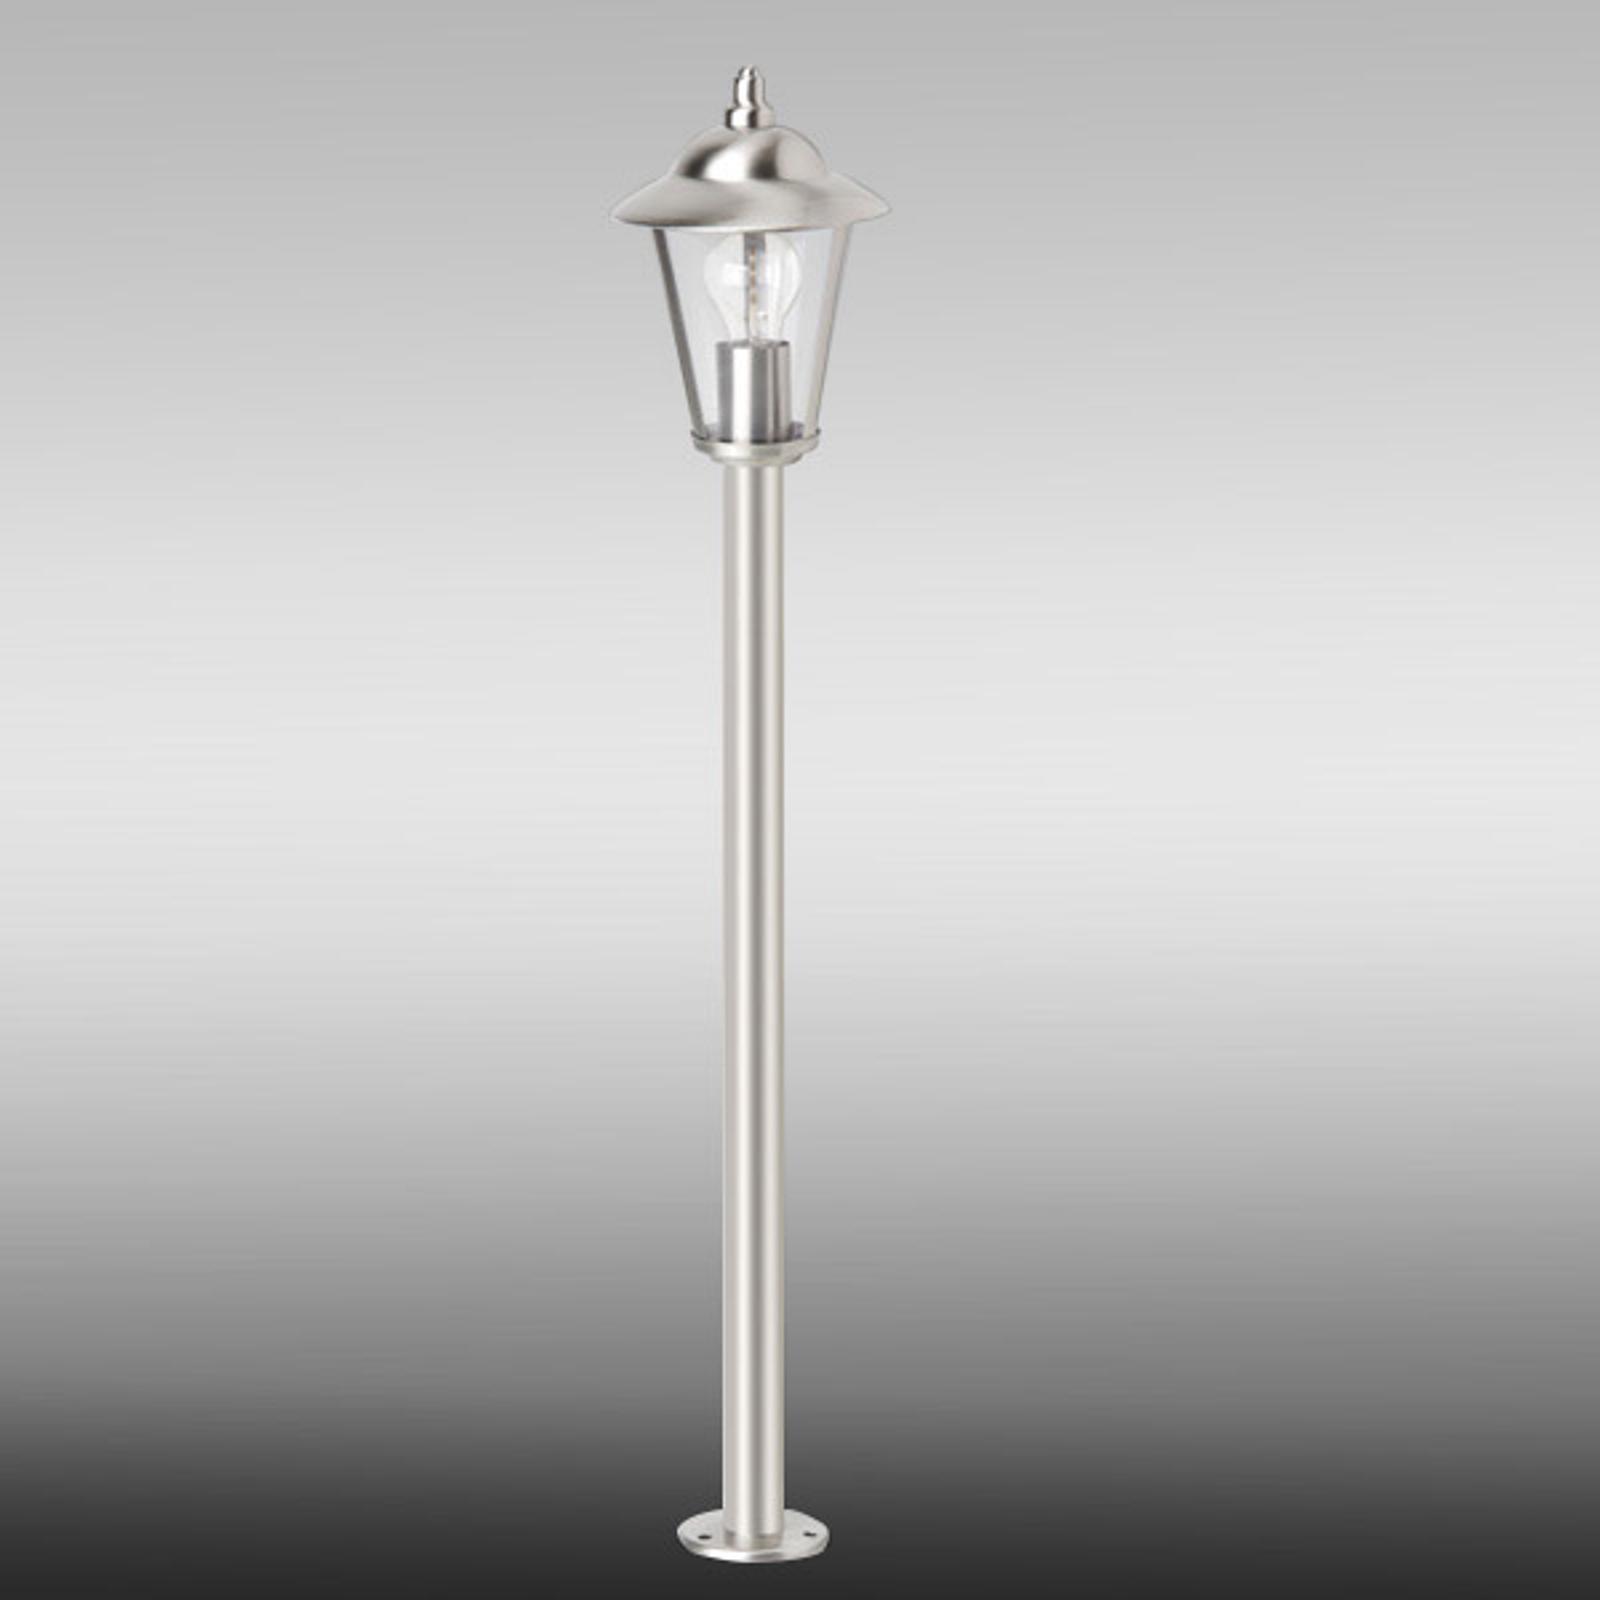 Lampioncino Neil dal design moderno